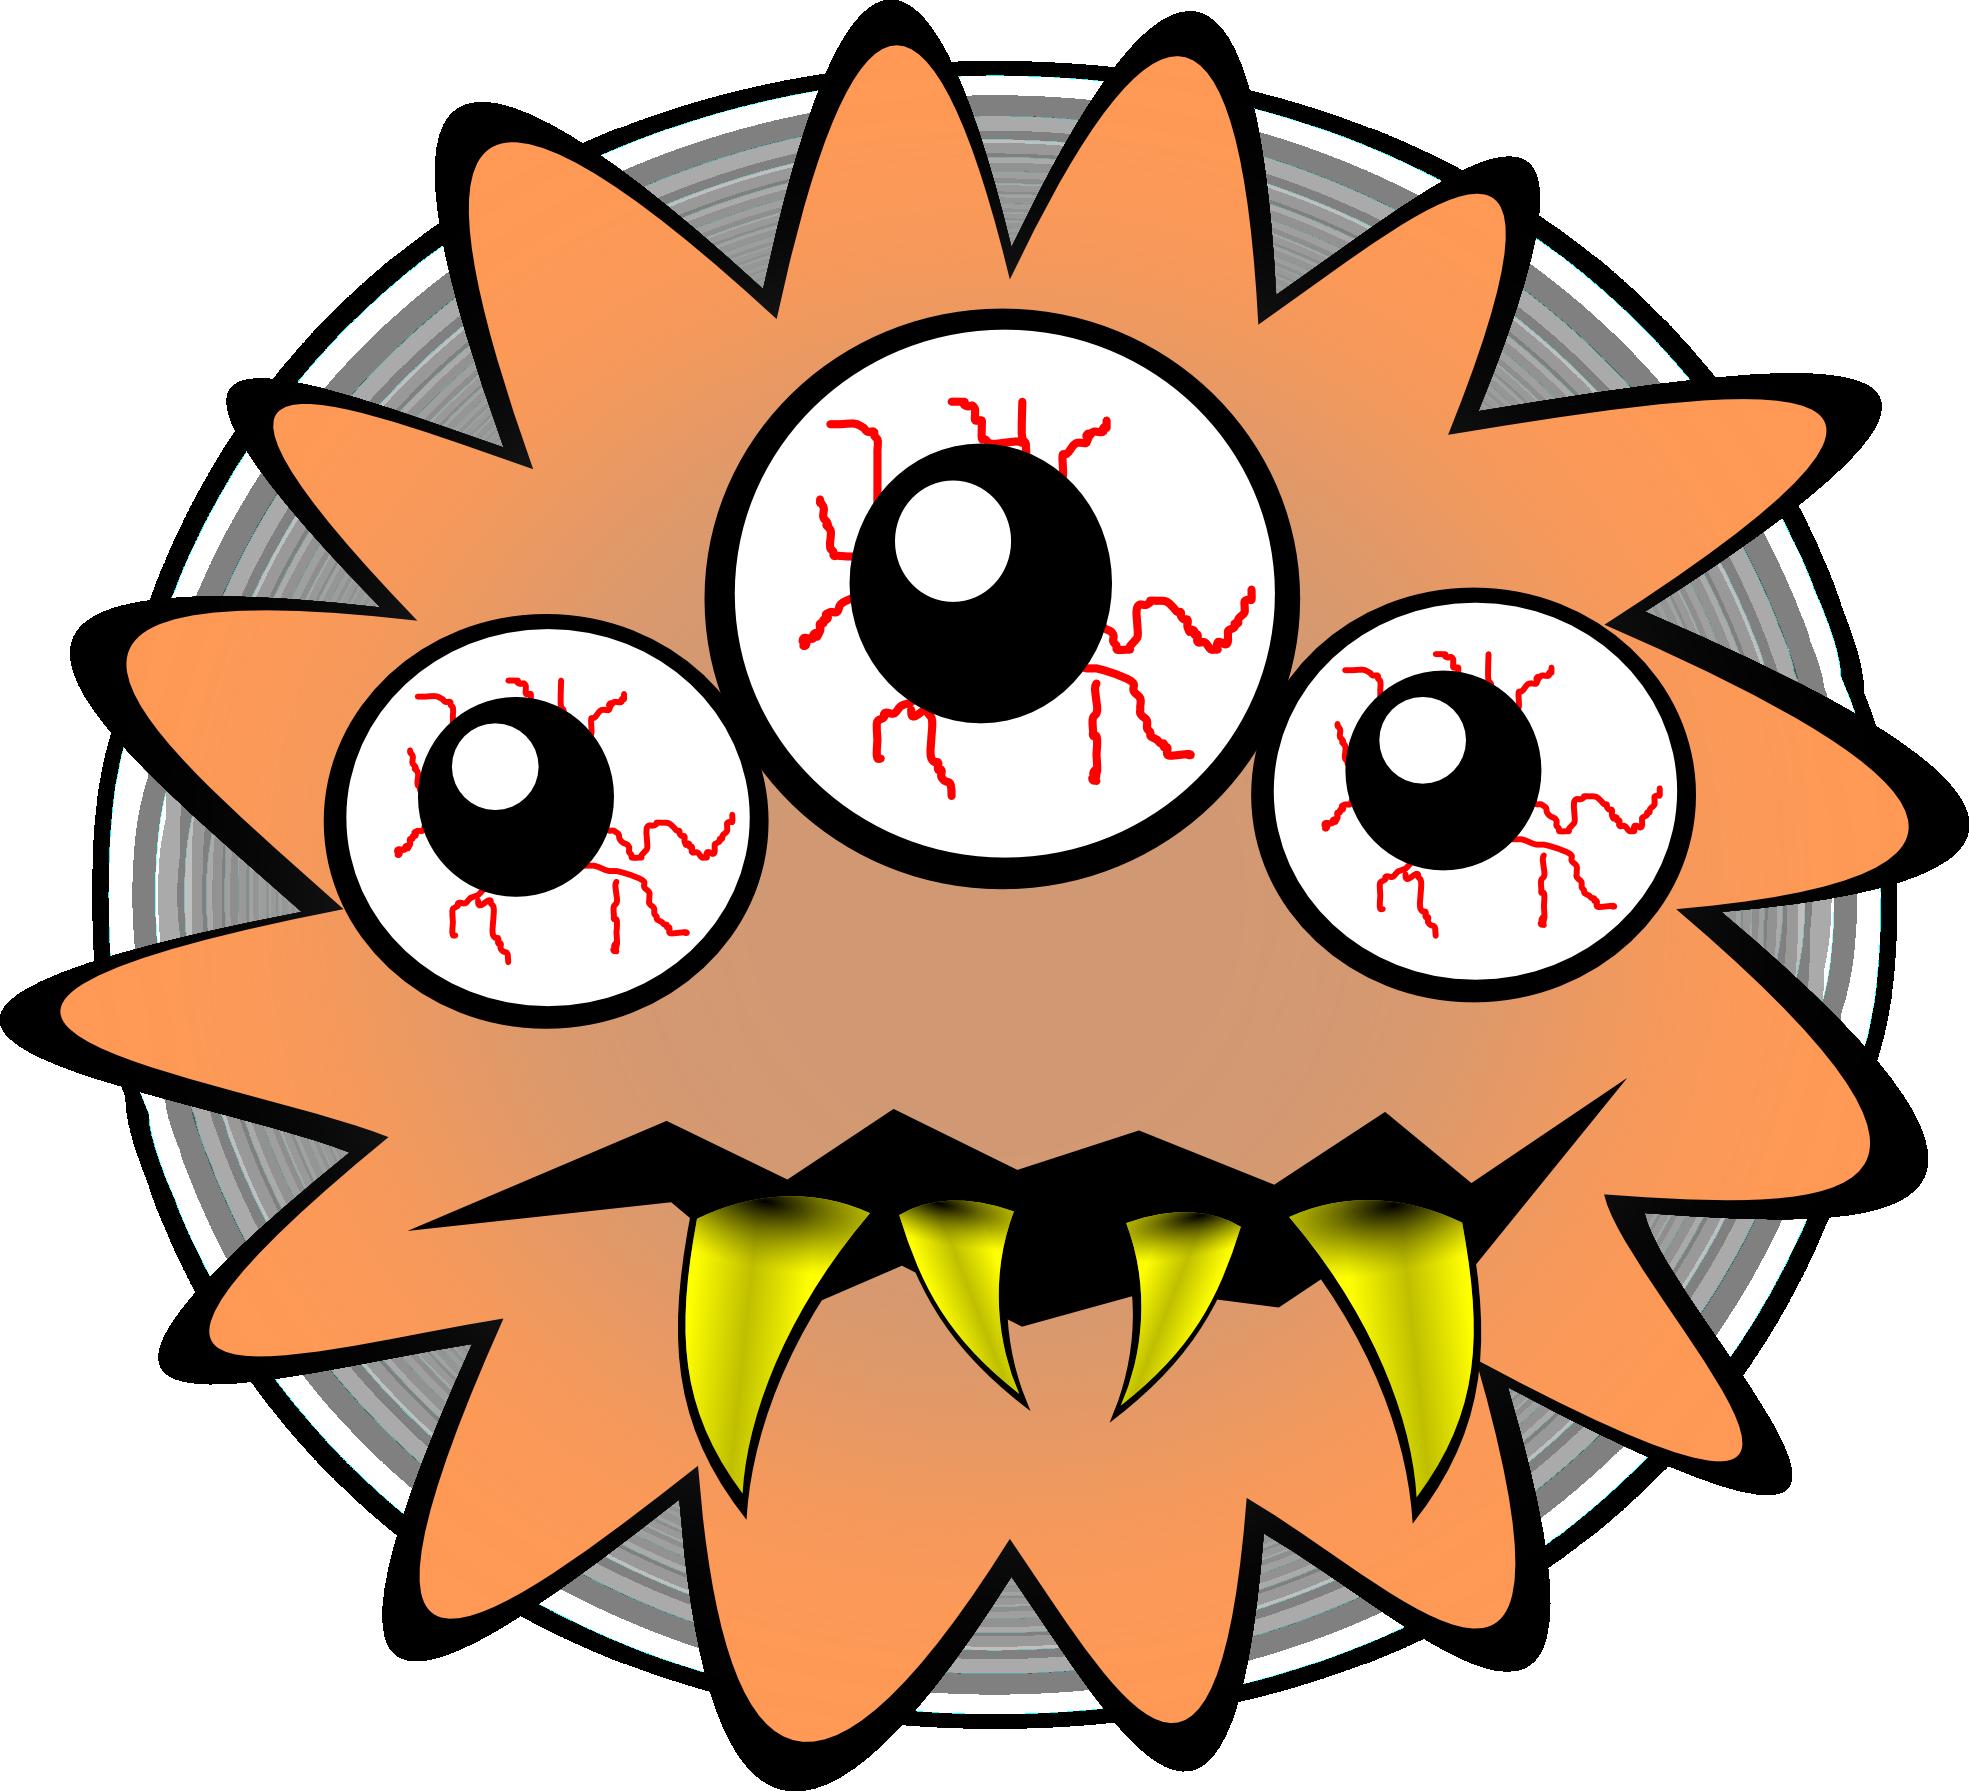 Germ Clipart - Cliparts.co